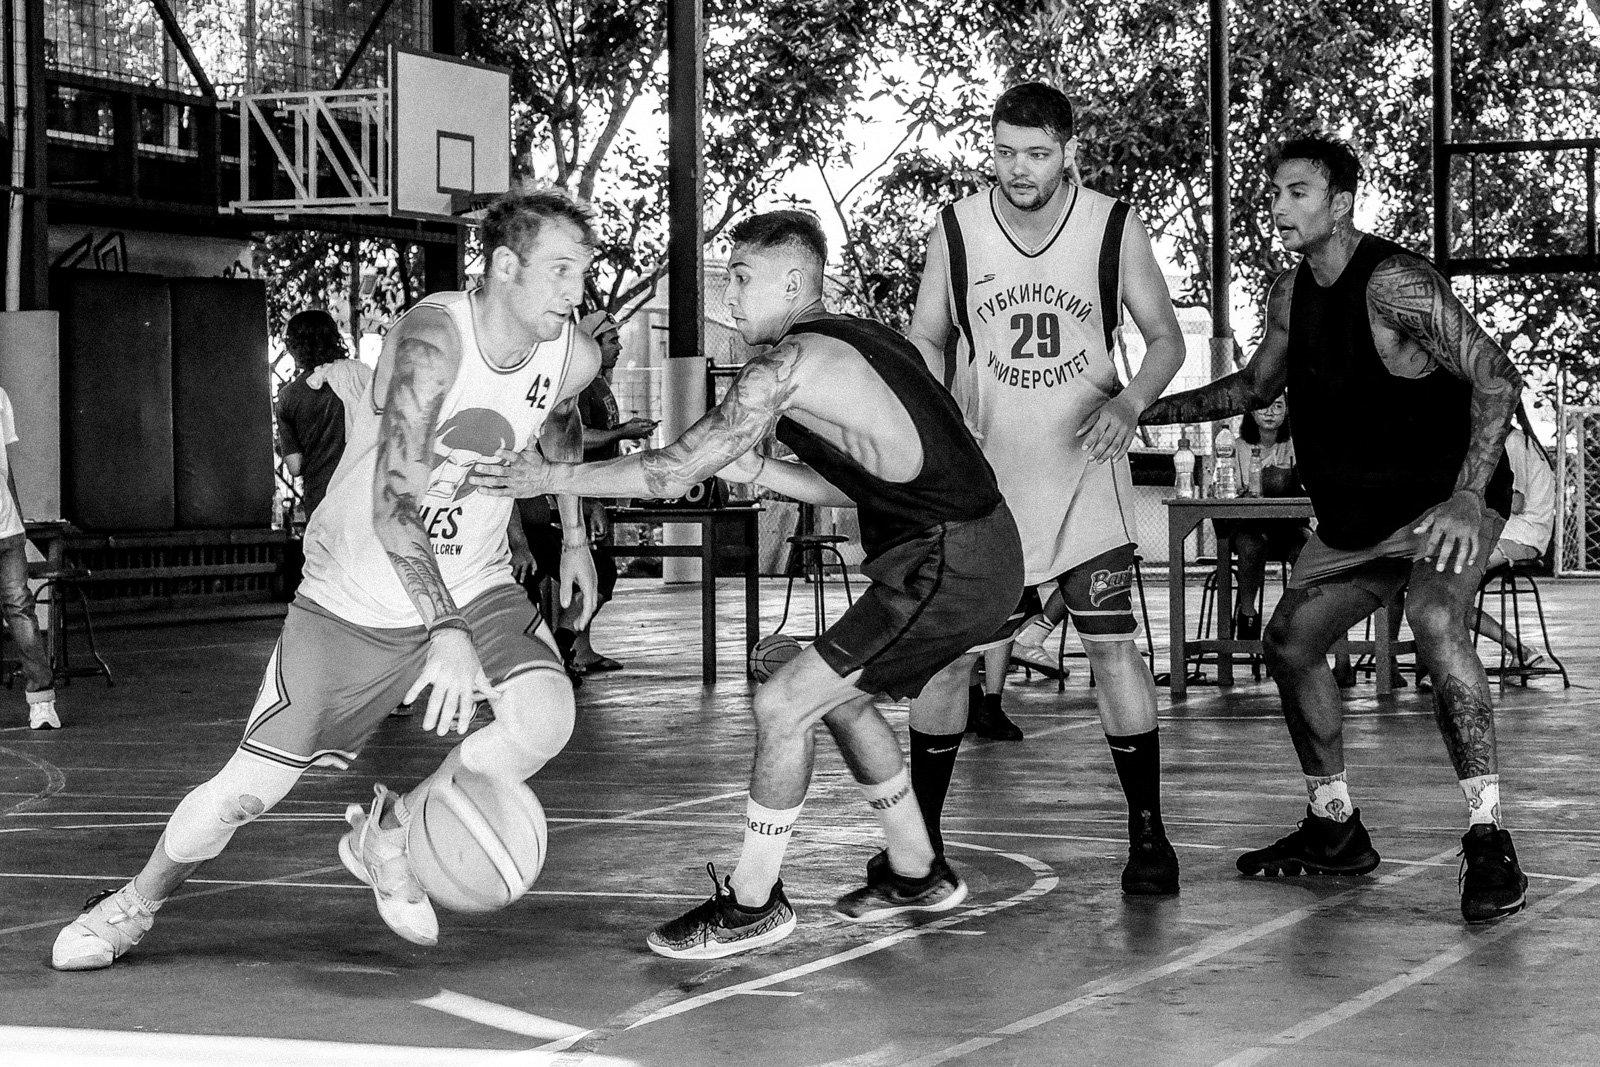 Indosole-第2回 コミュニティ支援 3on3チャリティーバスケットボールトーナメント